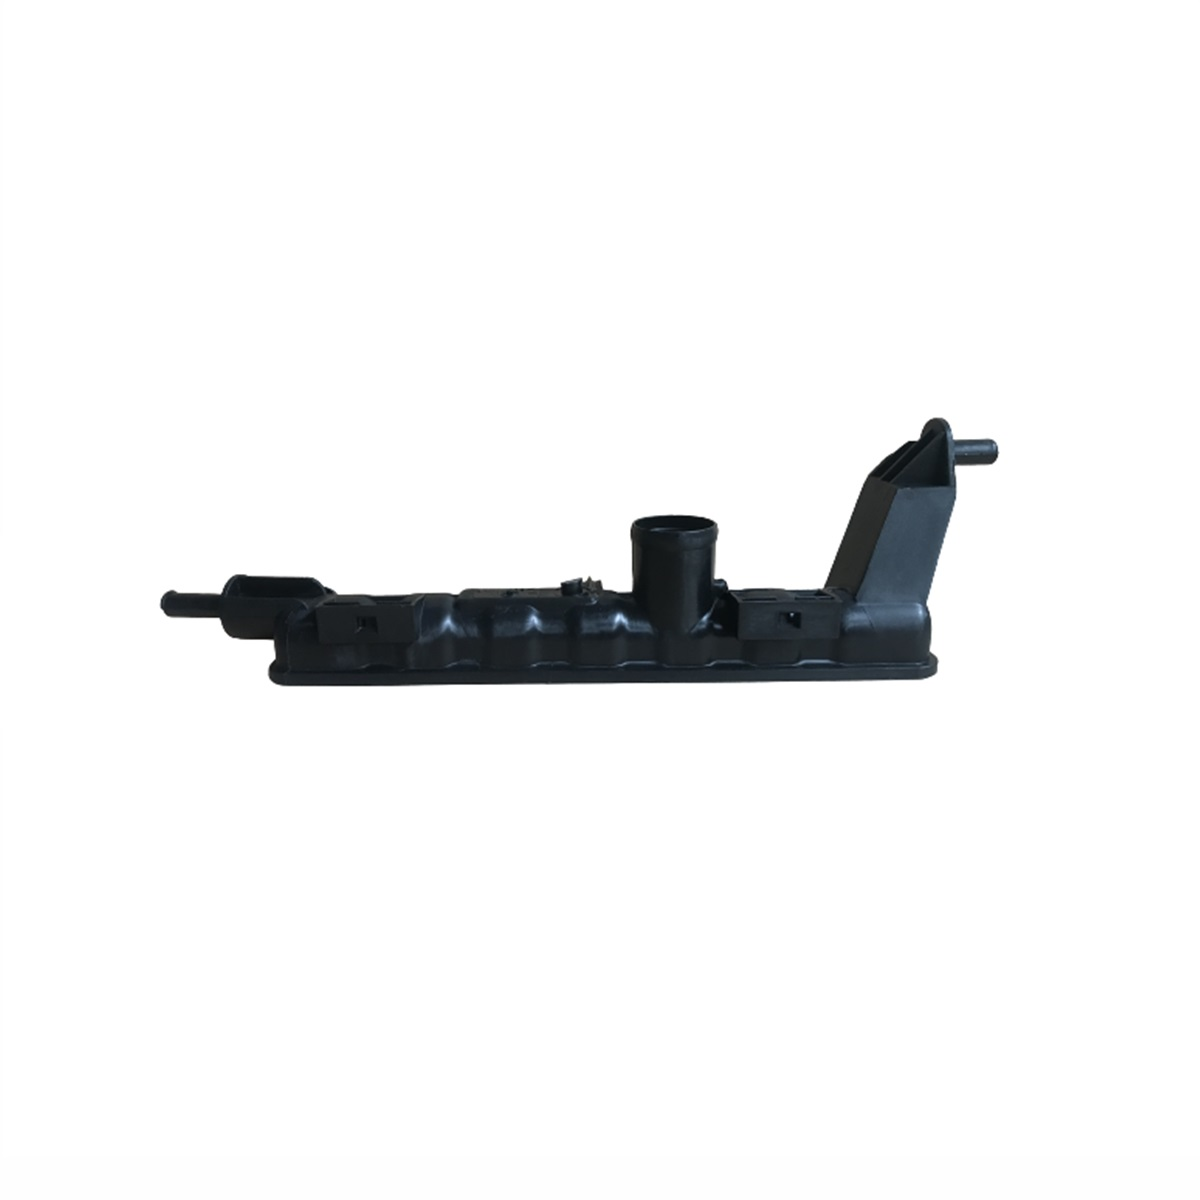 Caixa de Radiador Inferior Gm Celta Sem Ar 2000 a 2002 42mmx287mm